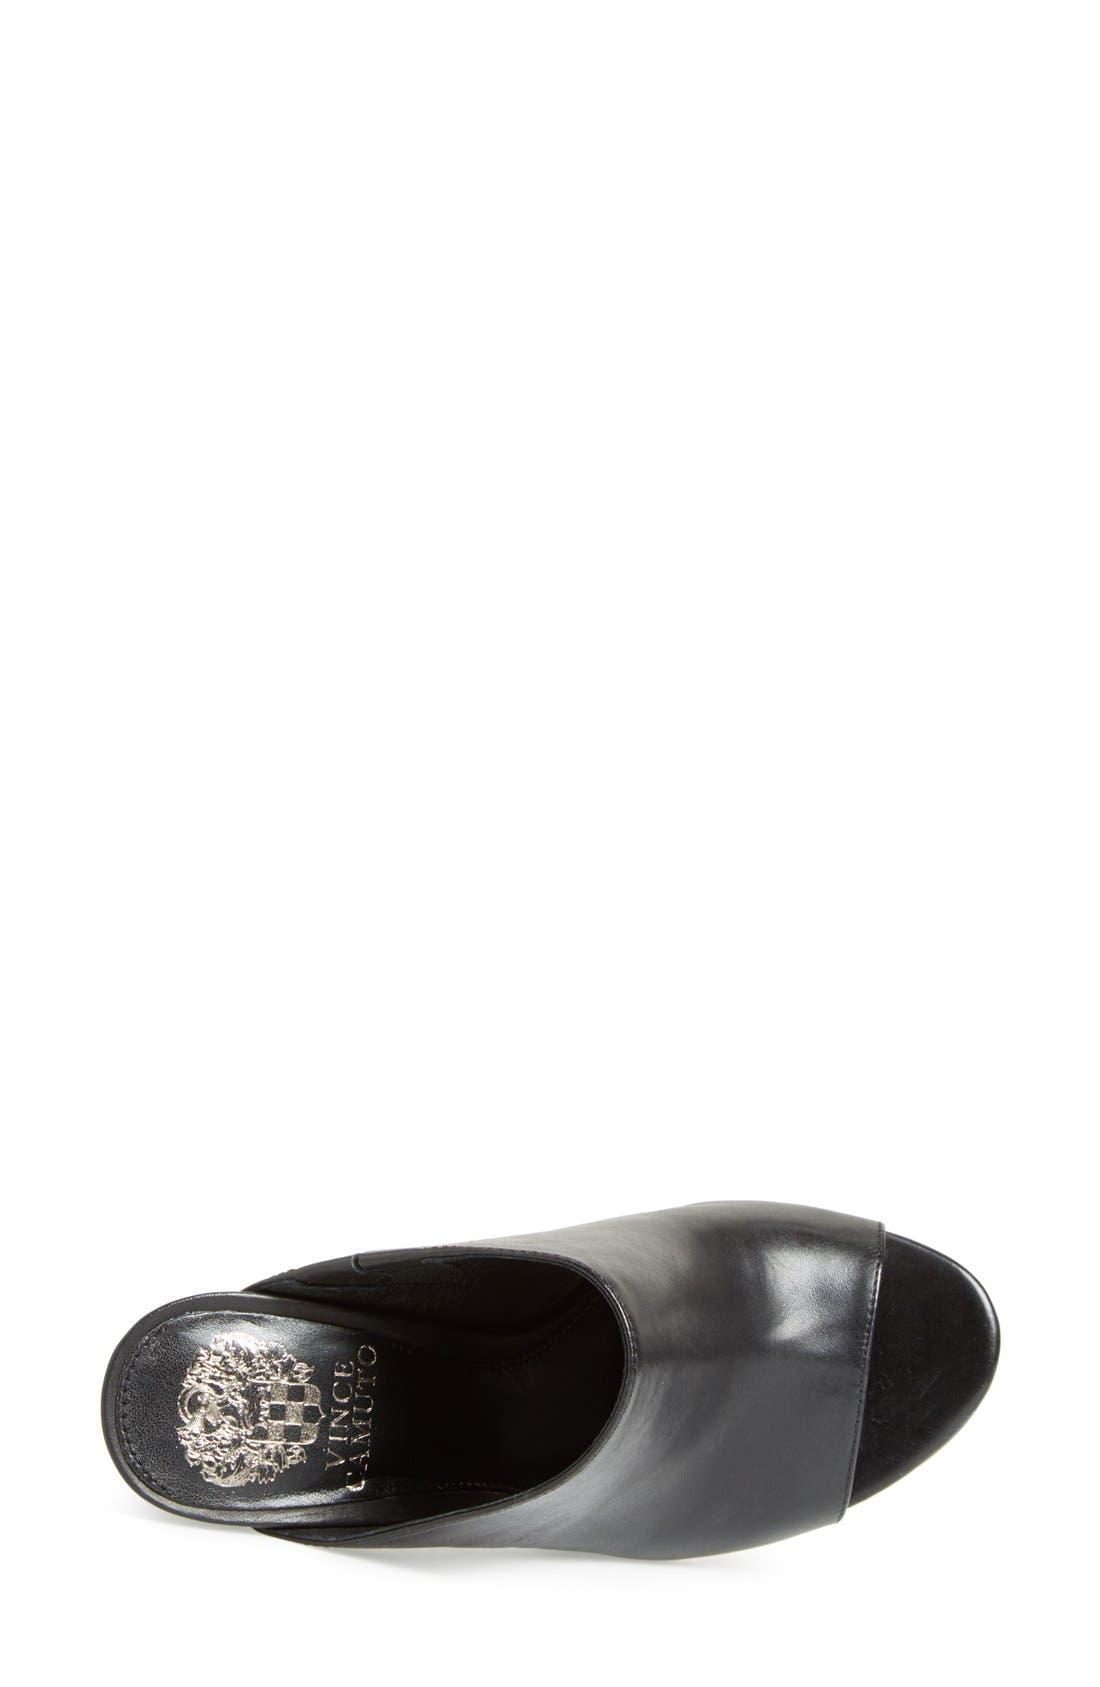 VINCE CAMUTO, 'Vestata' Leather Peep Toe Mule, Alternate thumbnail 2, color, 001